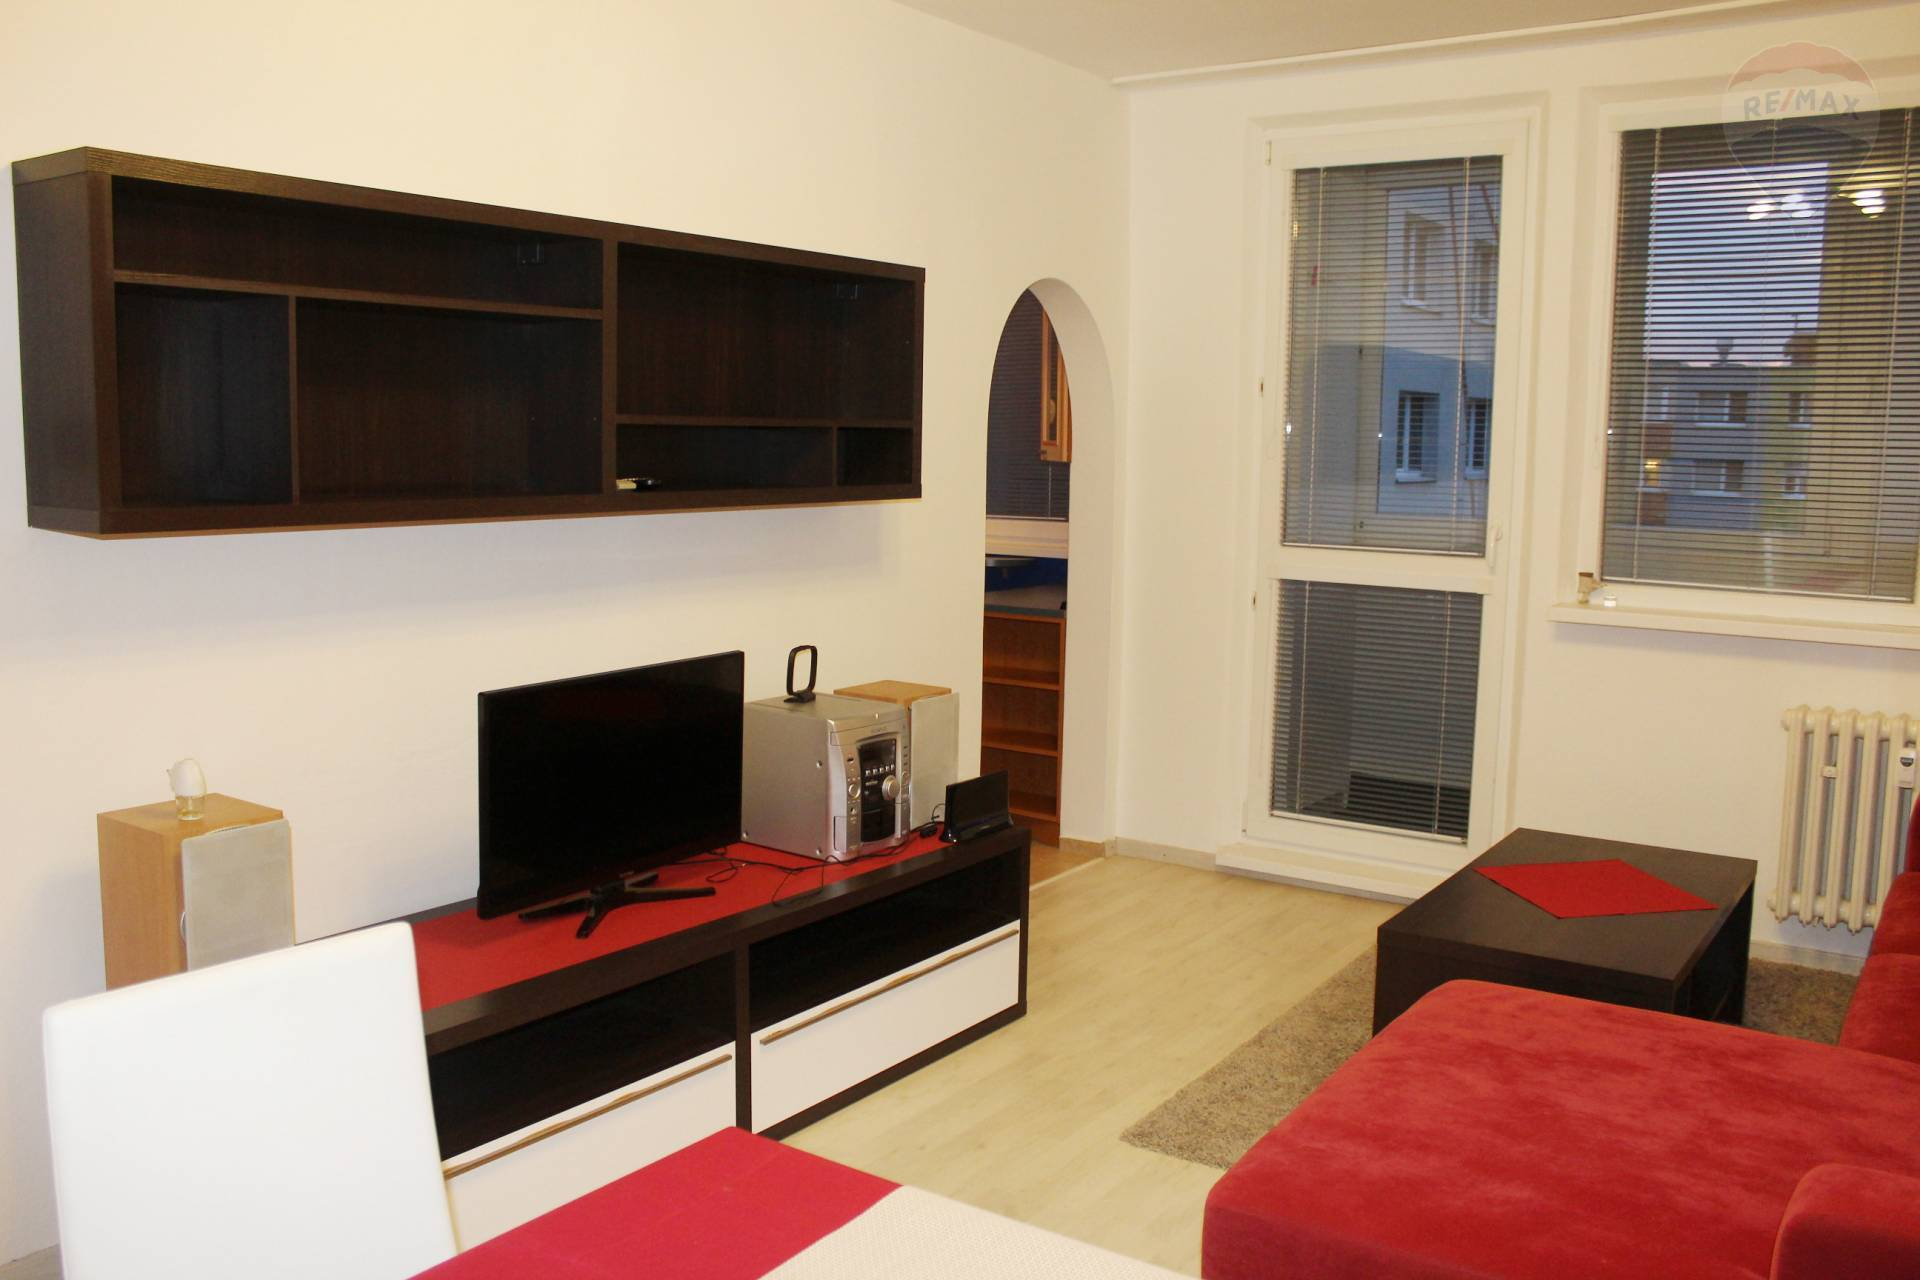 Prenájom bytu (3 izbový) 70 m2, Bratislava - Vrakuňa -